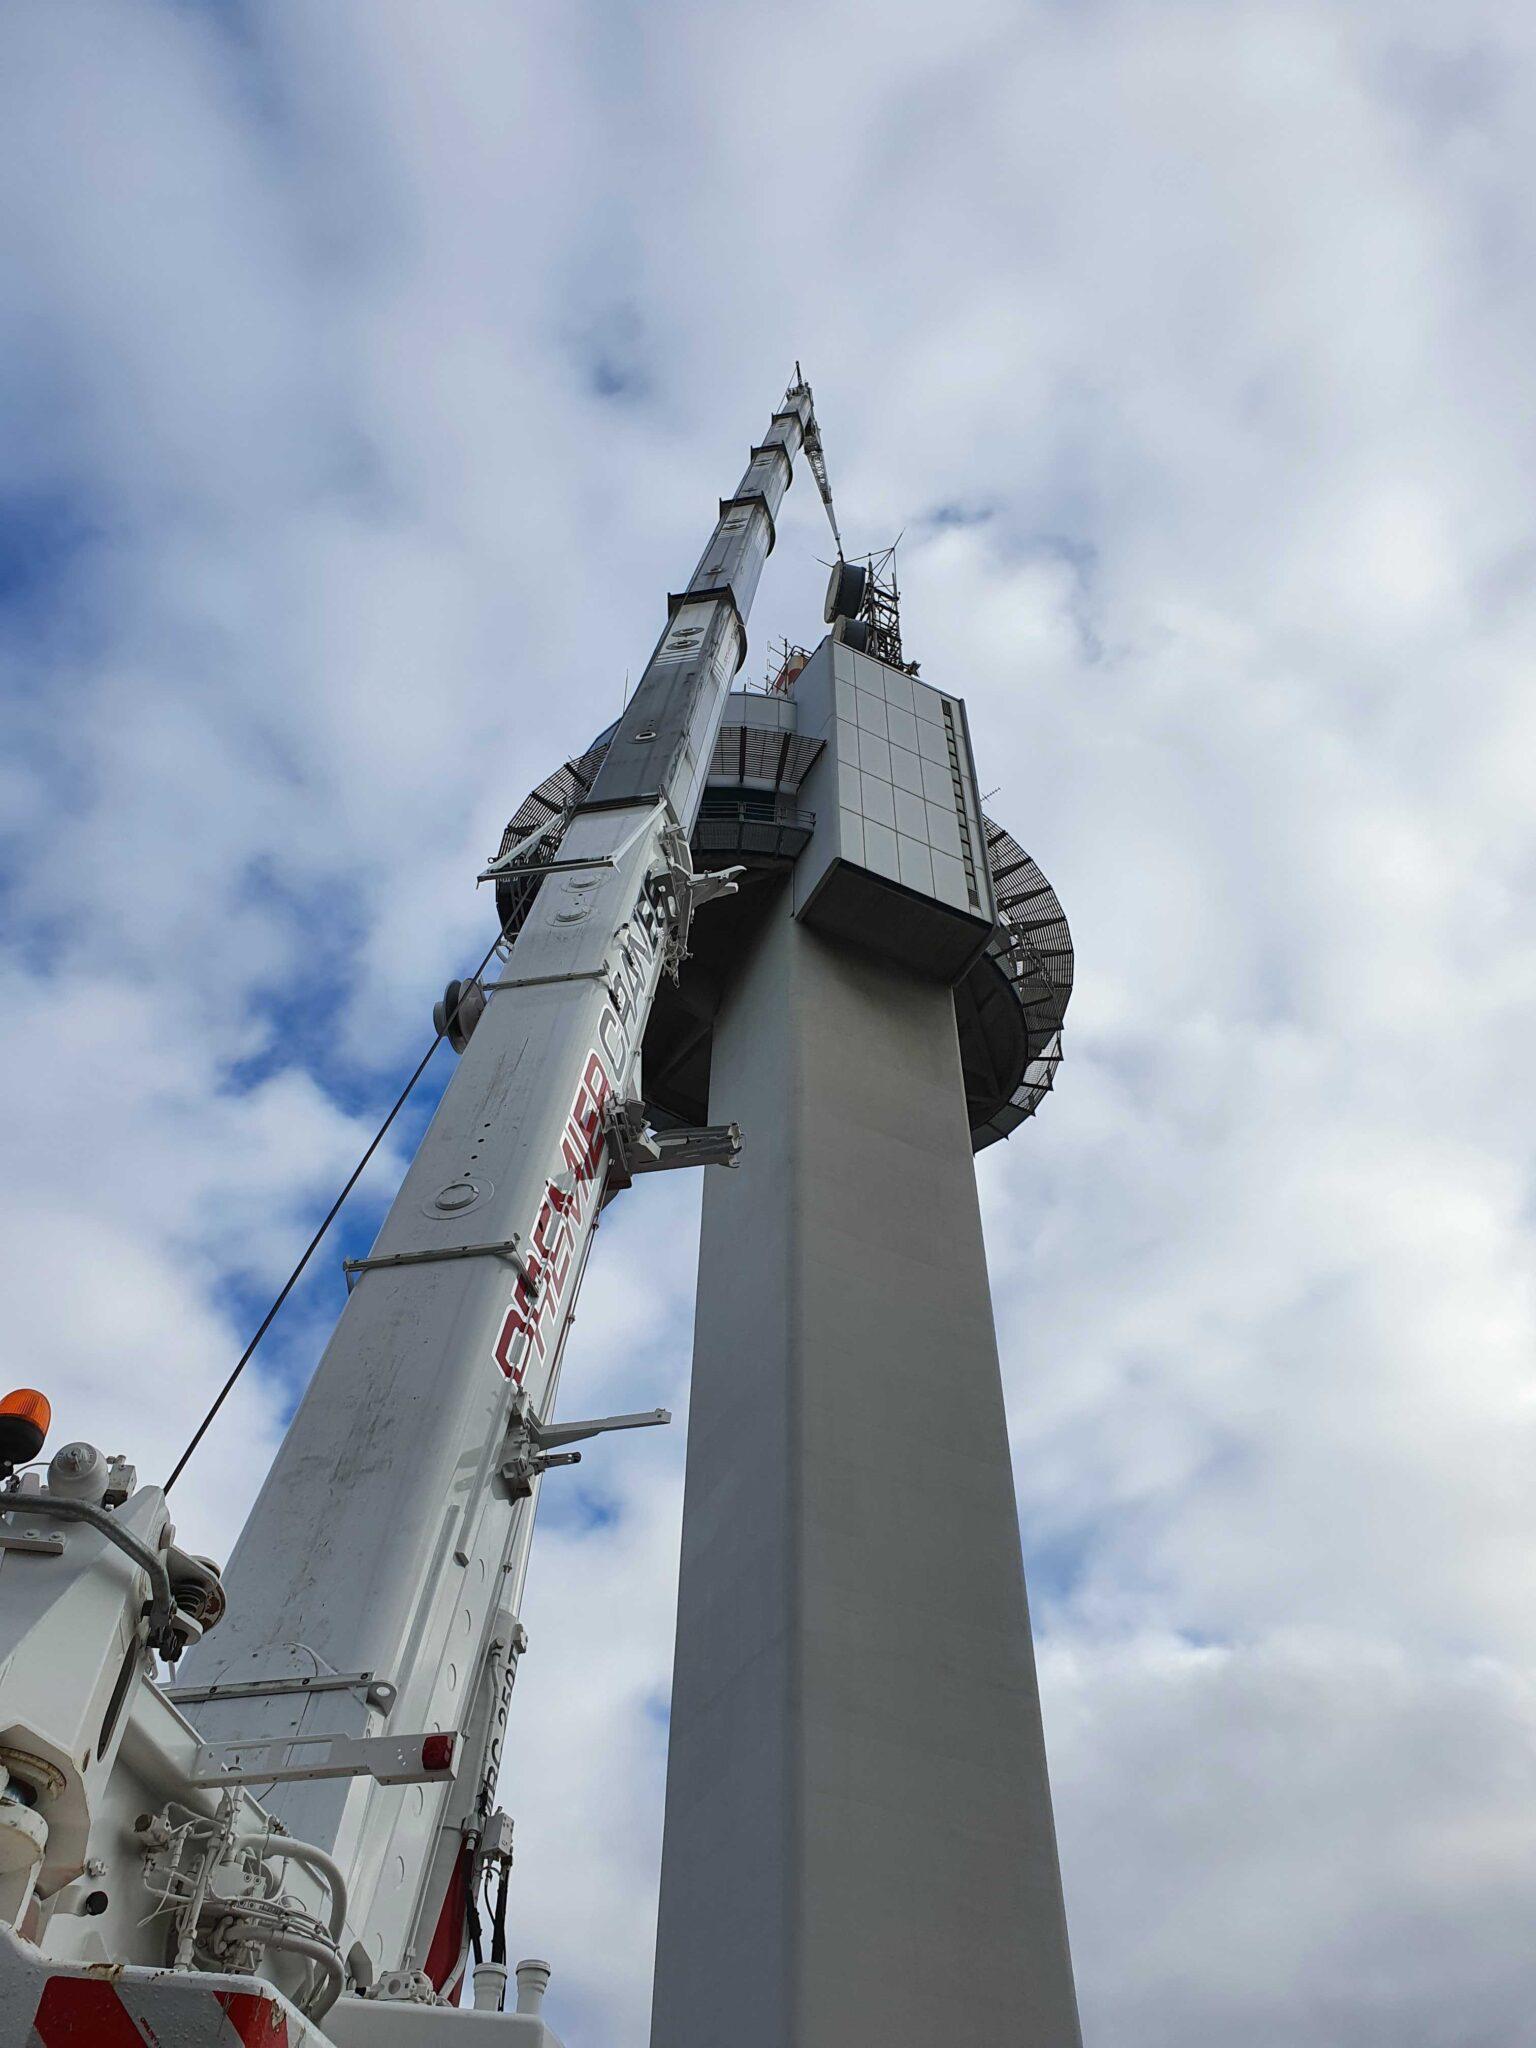 Tower Radar Replacement